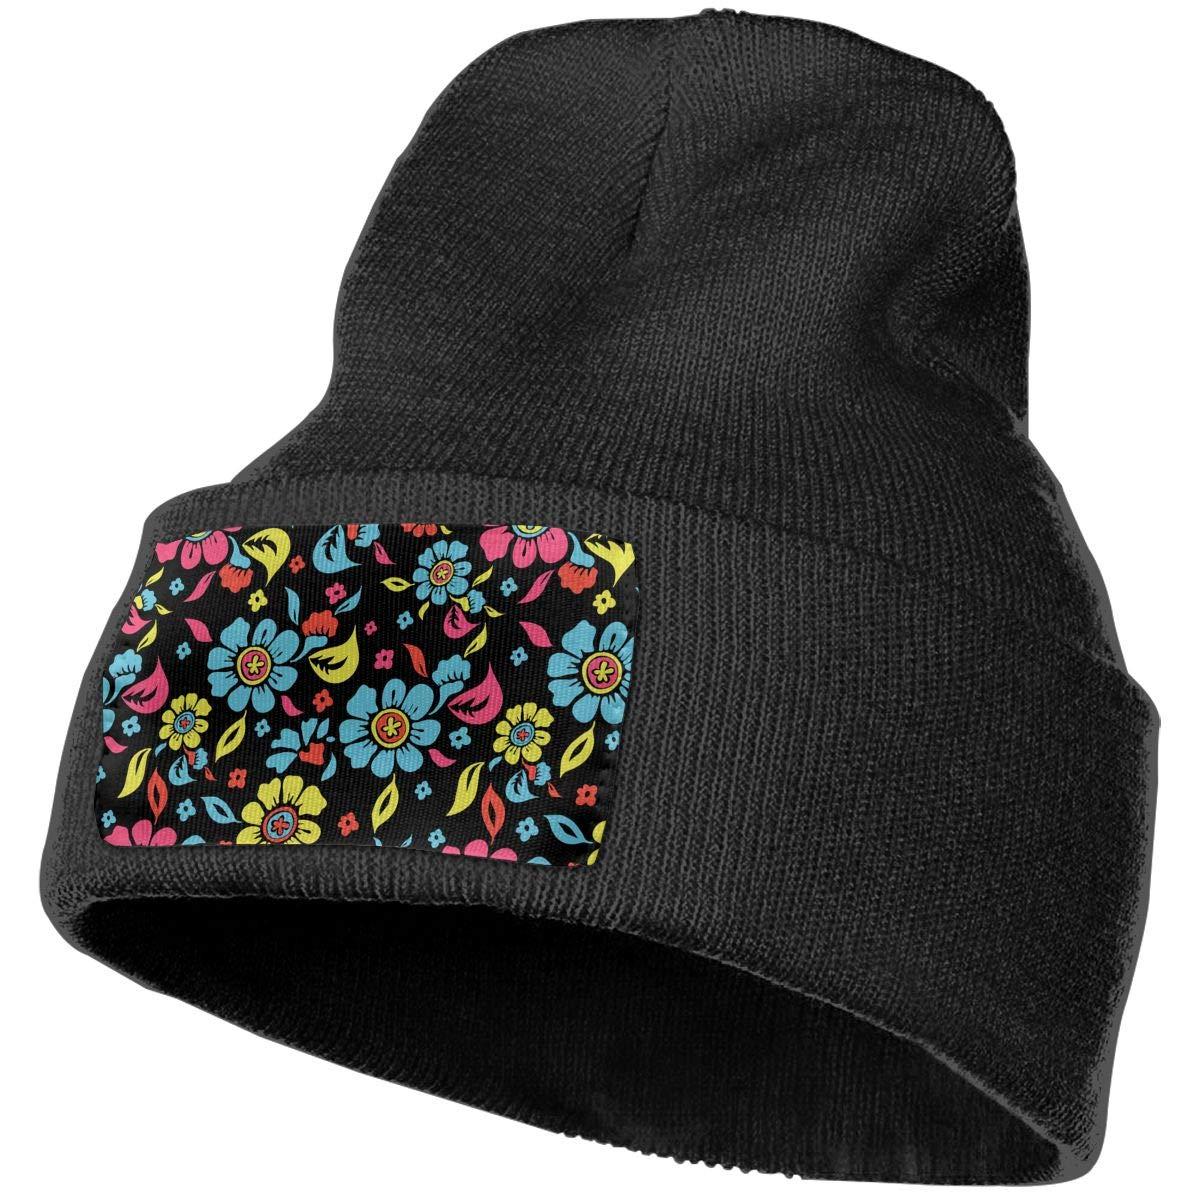 Ruin Brilliant Cartoon Fashion Knitting Hat for Men Women 100/% Acrylic Acid Mas Beanie Hat